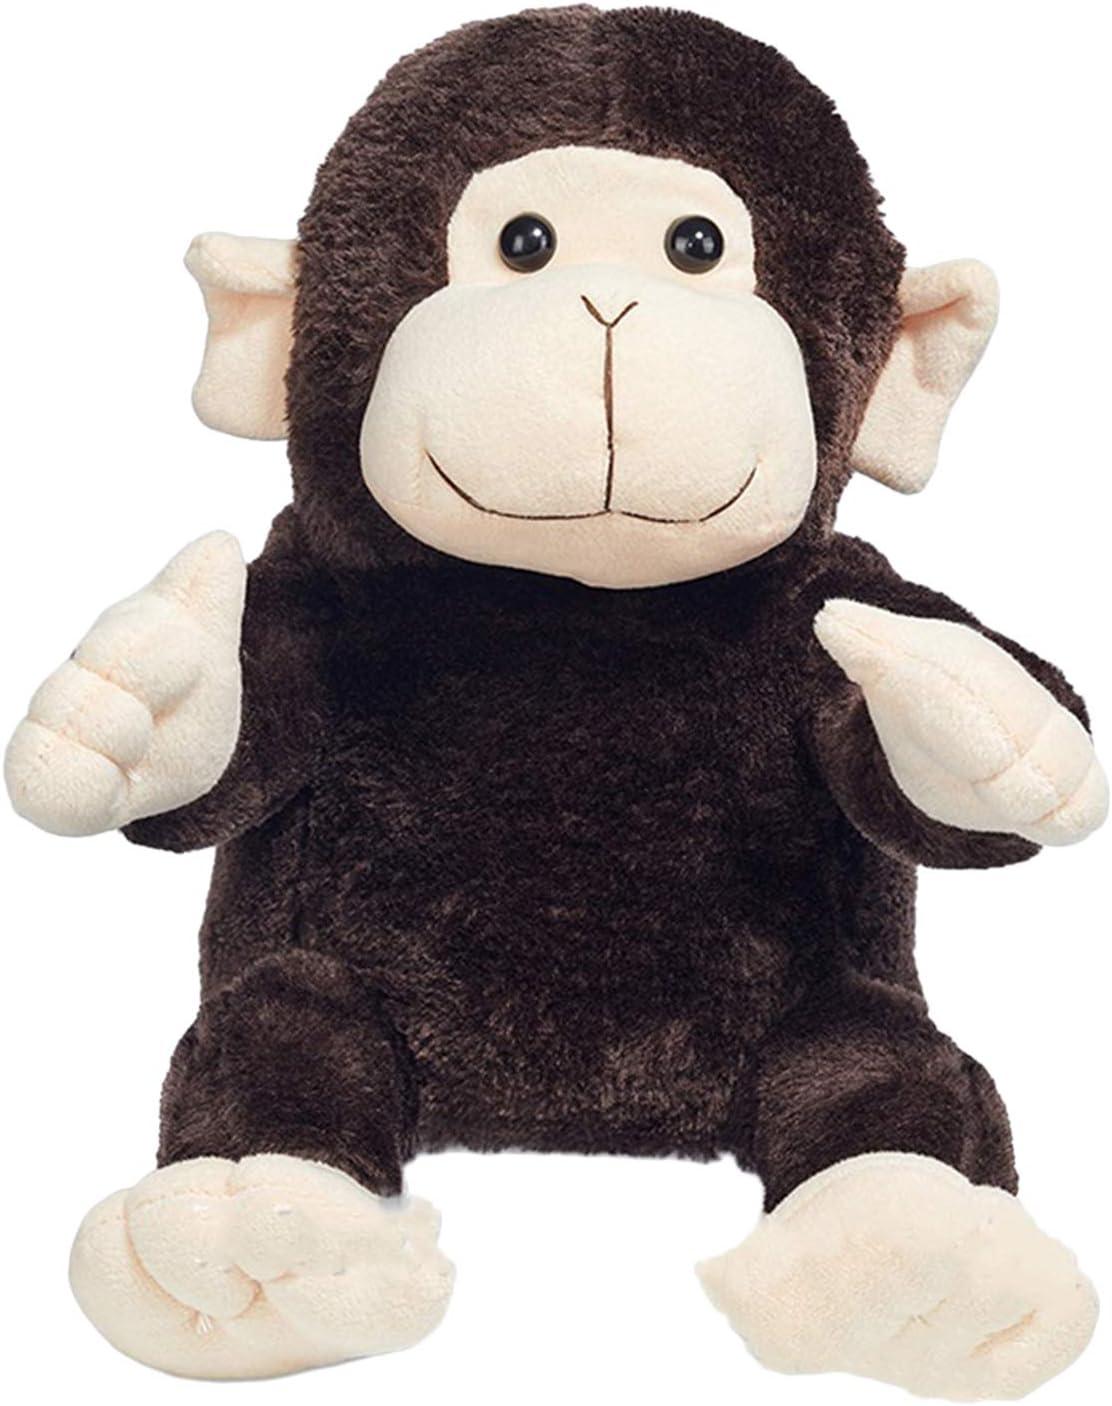 Jili Phoenix Mall Online Plush Monkey Animal Golf Max 90% OFF Headcover Head Club Cover f